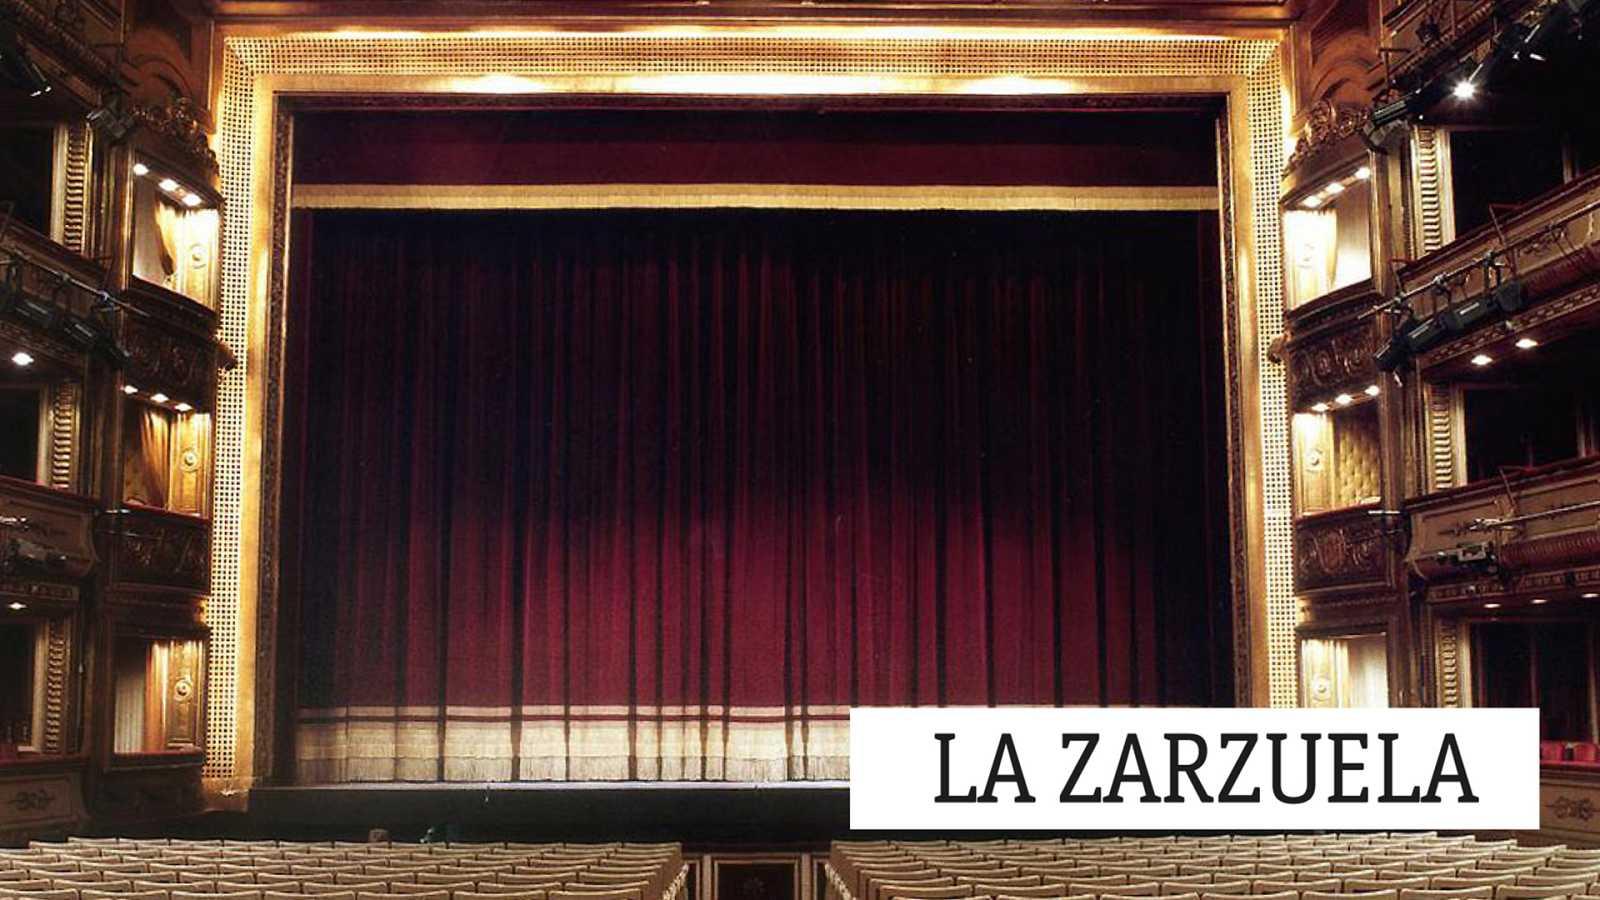 La zarzuela - Grandes voces de zarzuela: Marcos Redondo - 28/04/21 - escuchar ahora